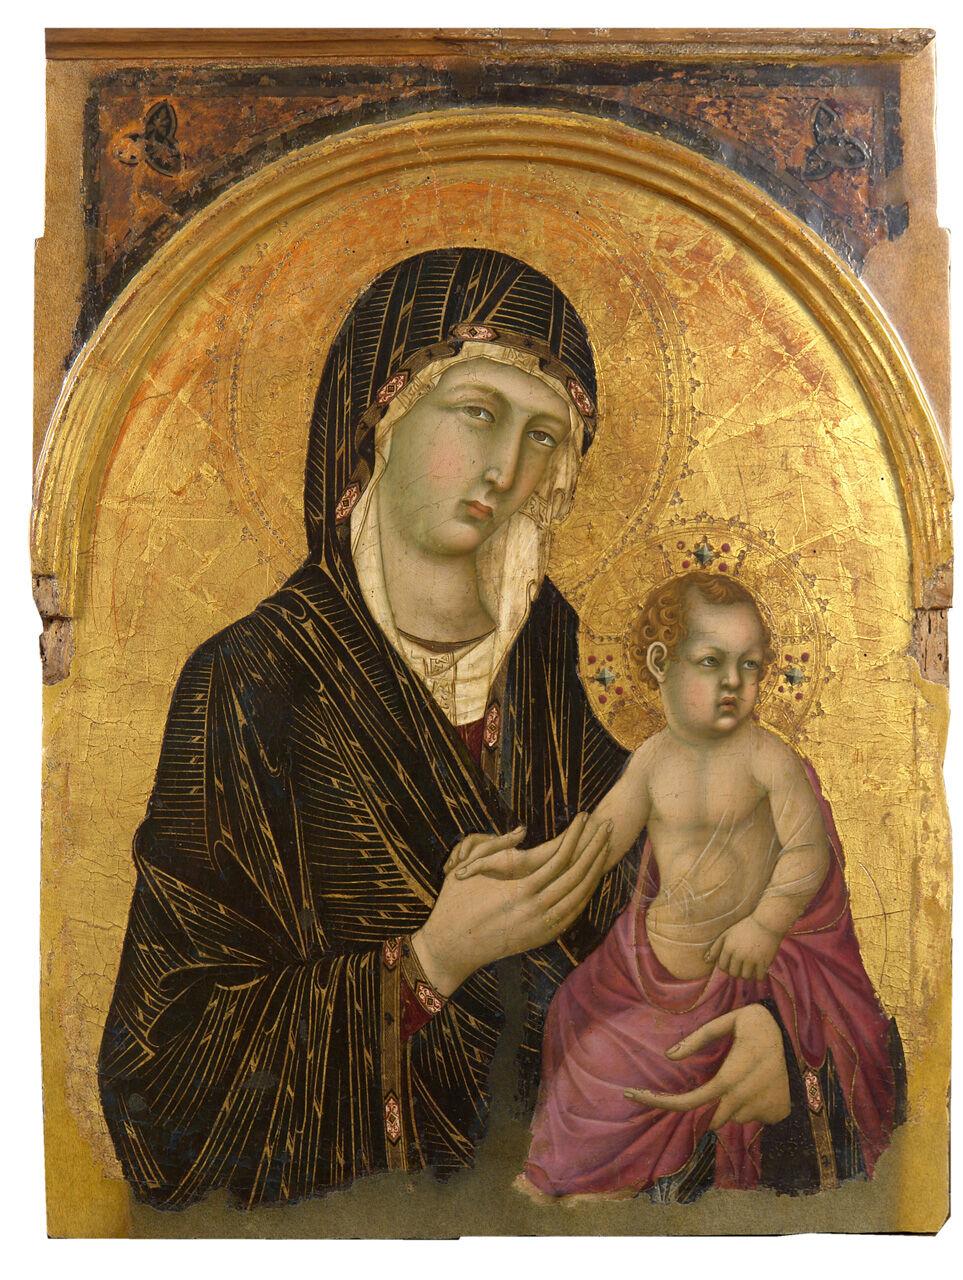 Simone Martini, Madonna col Bambino n.583, 1305–10. Image via Wikimedia Common.